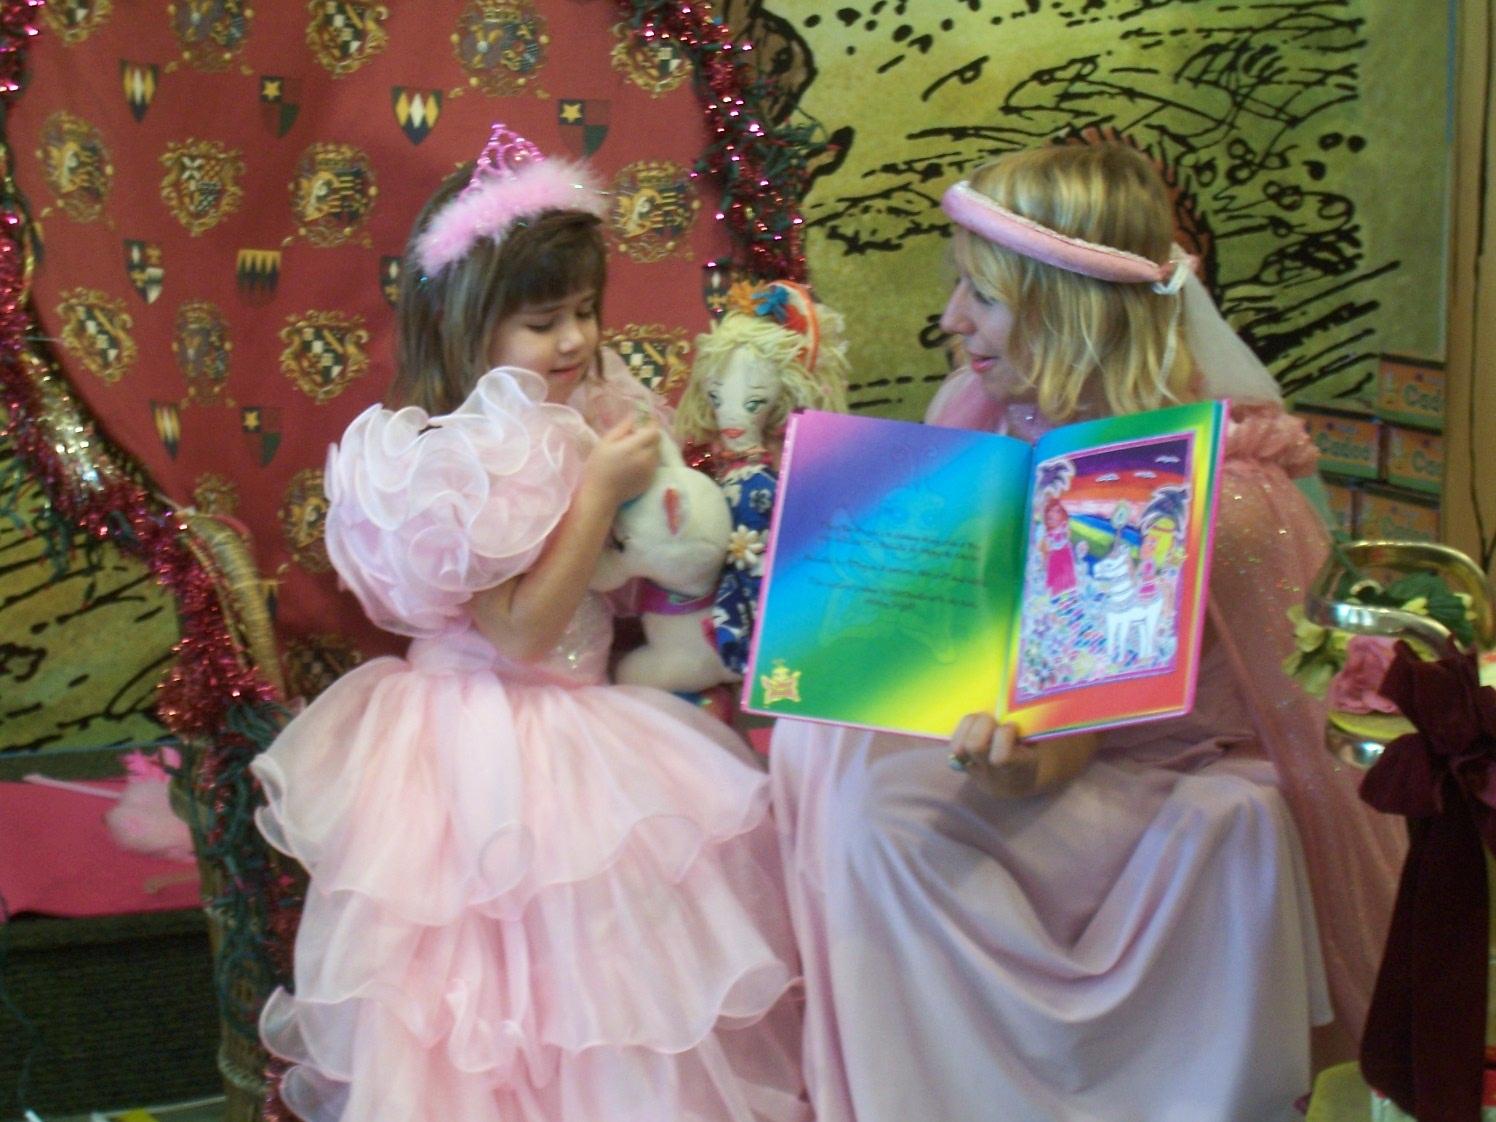 Krendoll princess loves UniCandle unicorn